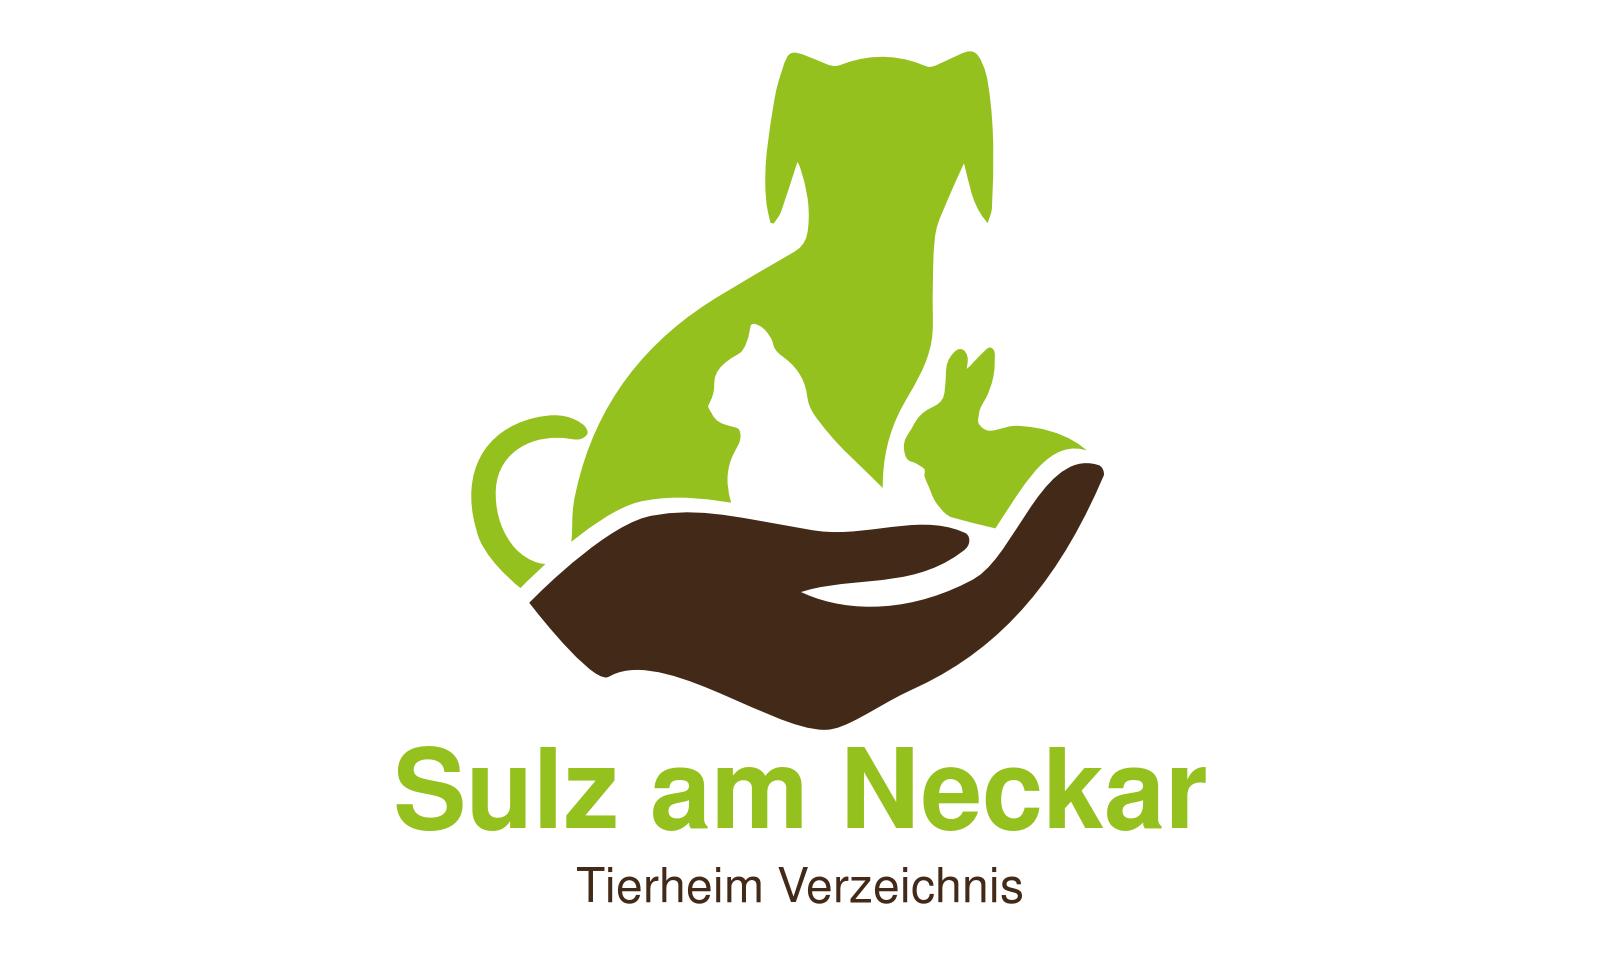 Tierheim Sulz am Neckar